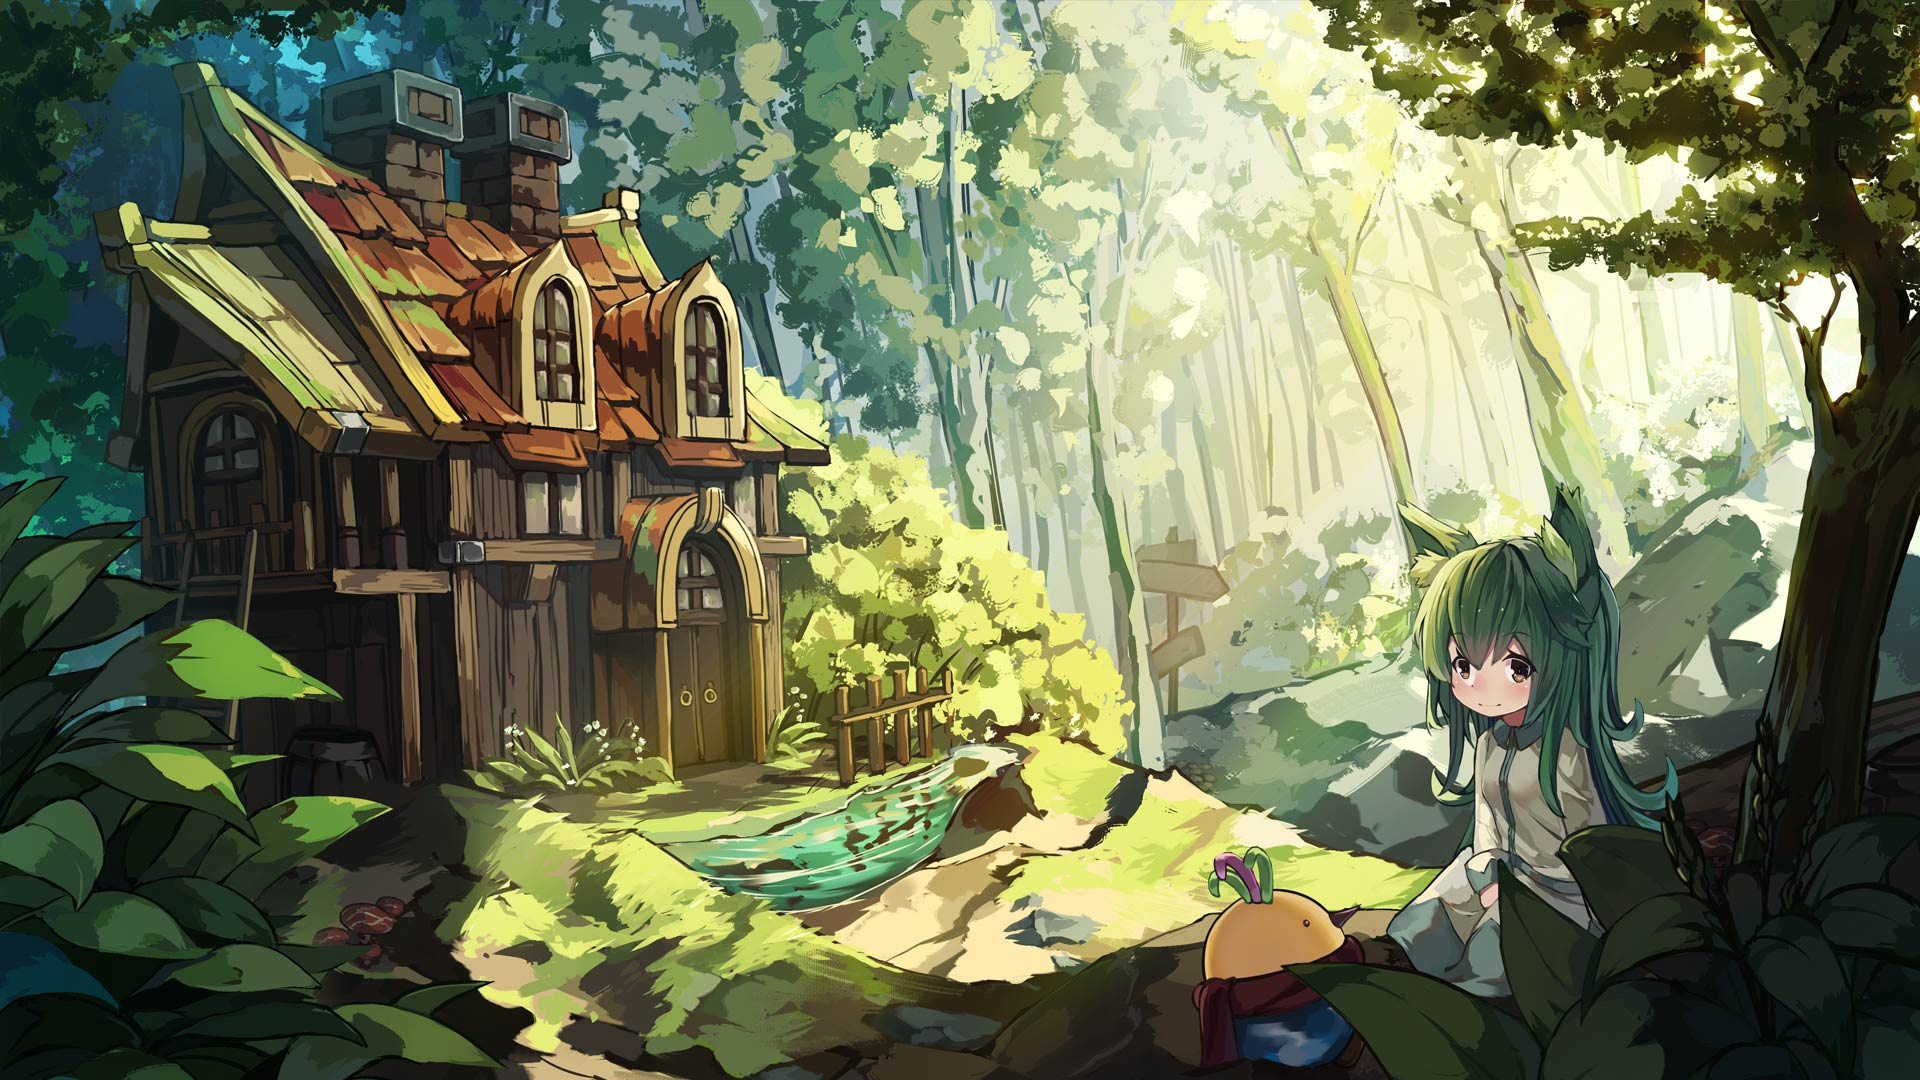 marchen forest game wallpaper 73422